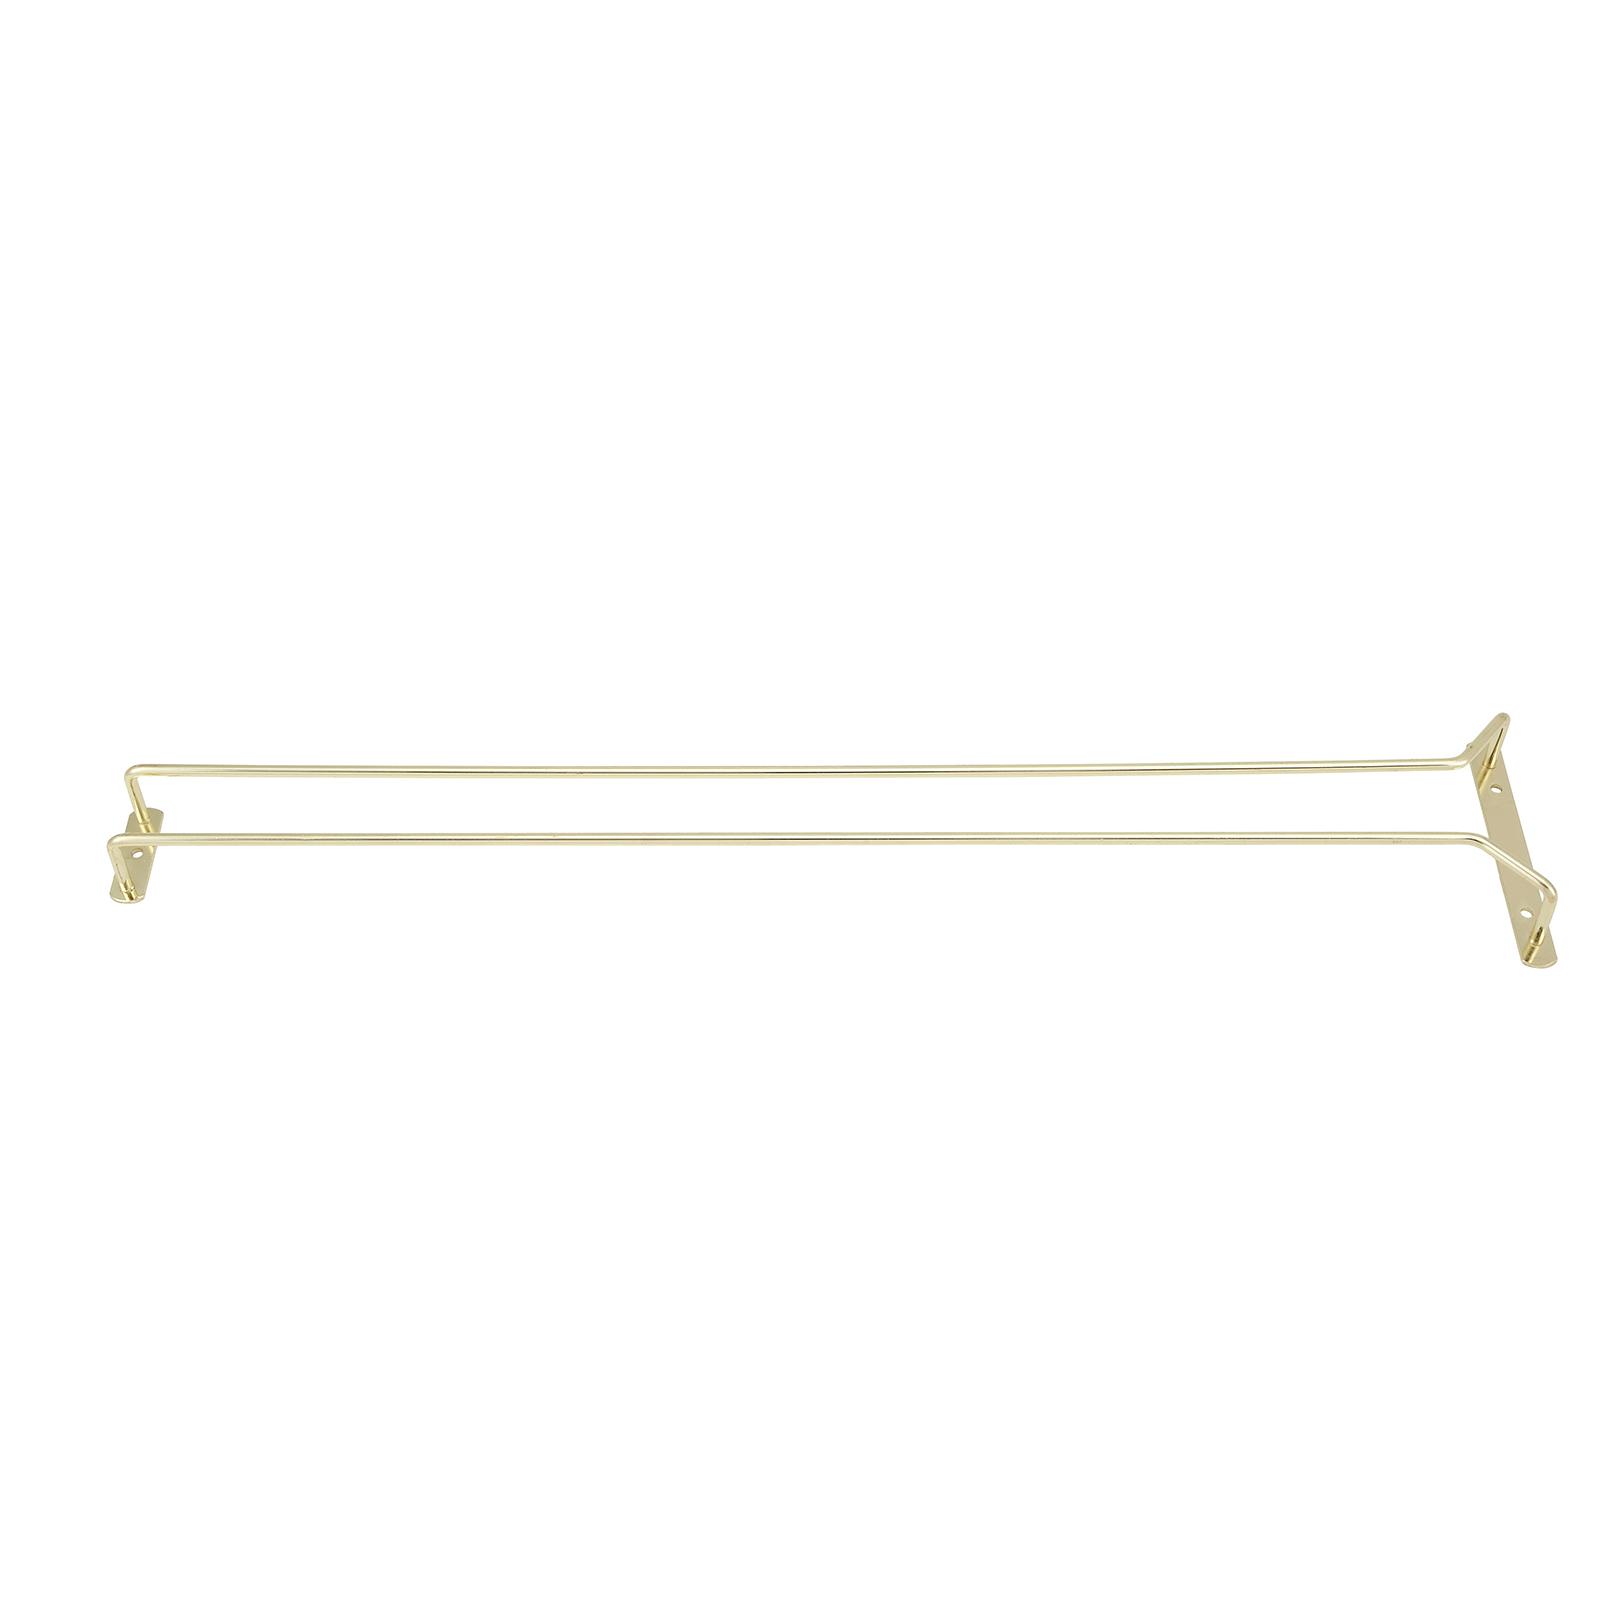 "24"" Wire Glass Hanger, Winco GH-24"